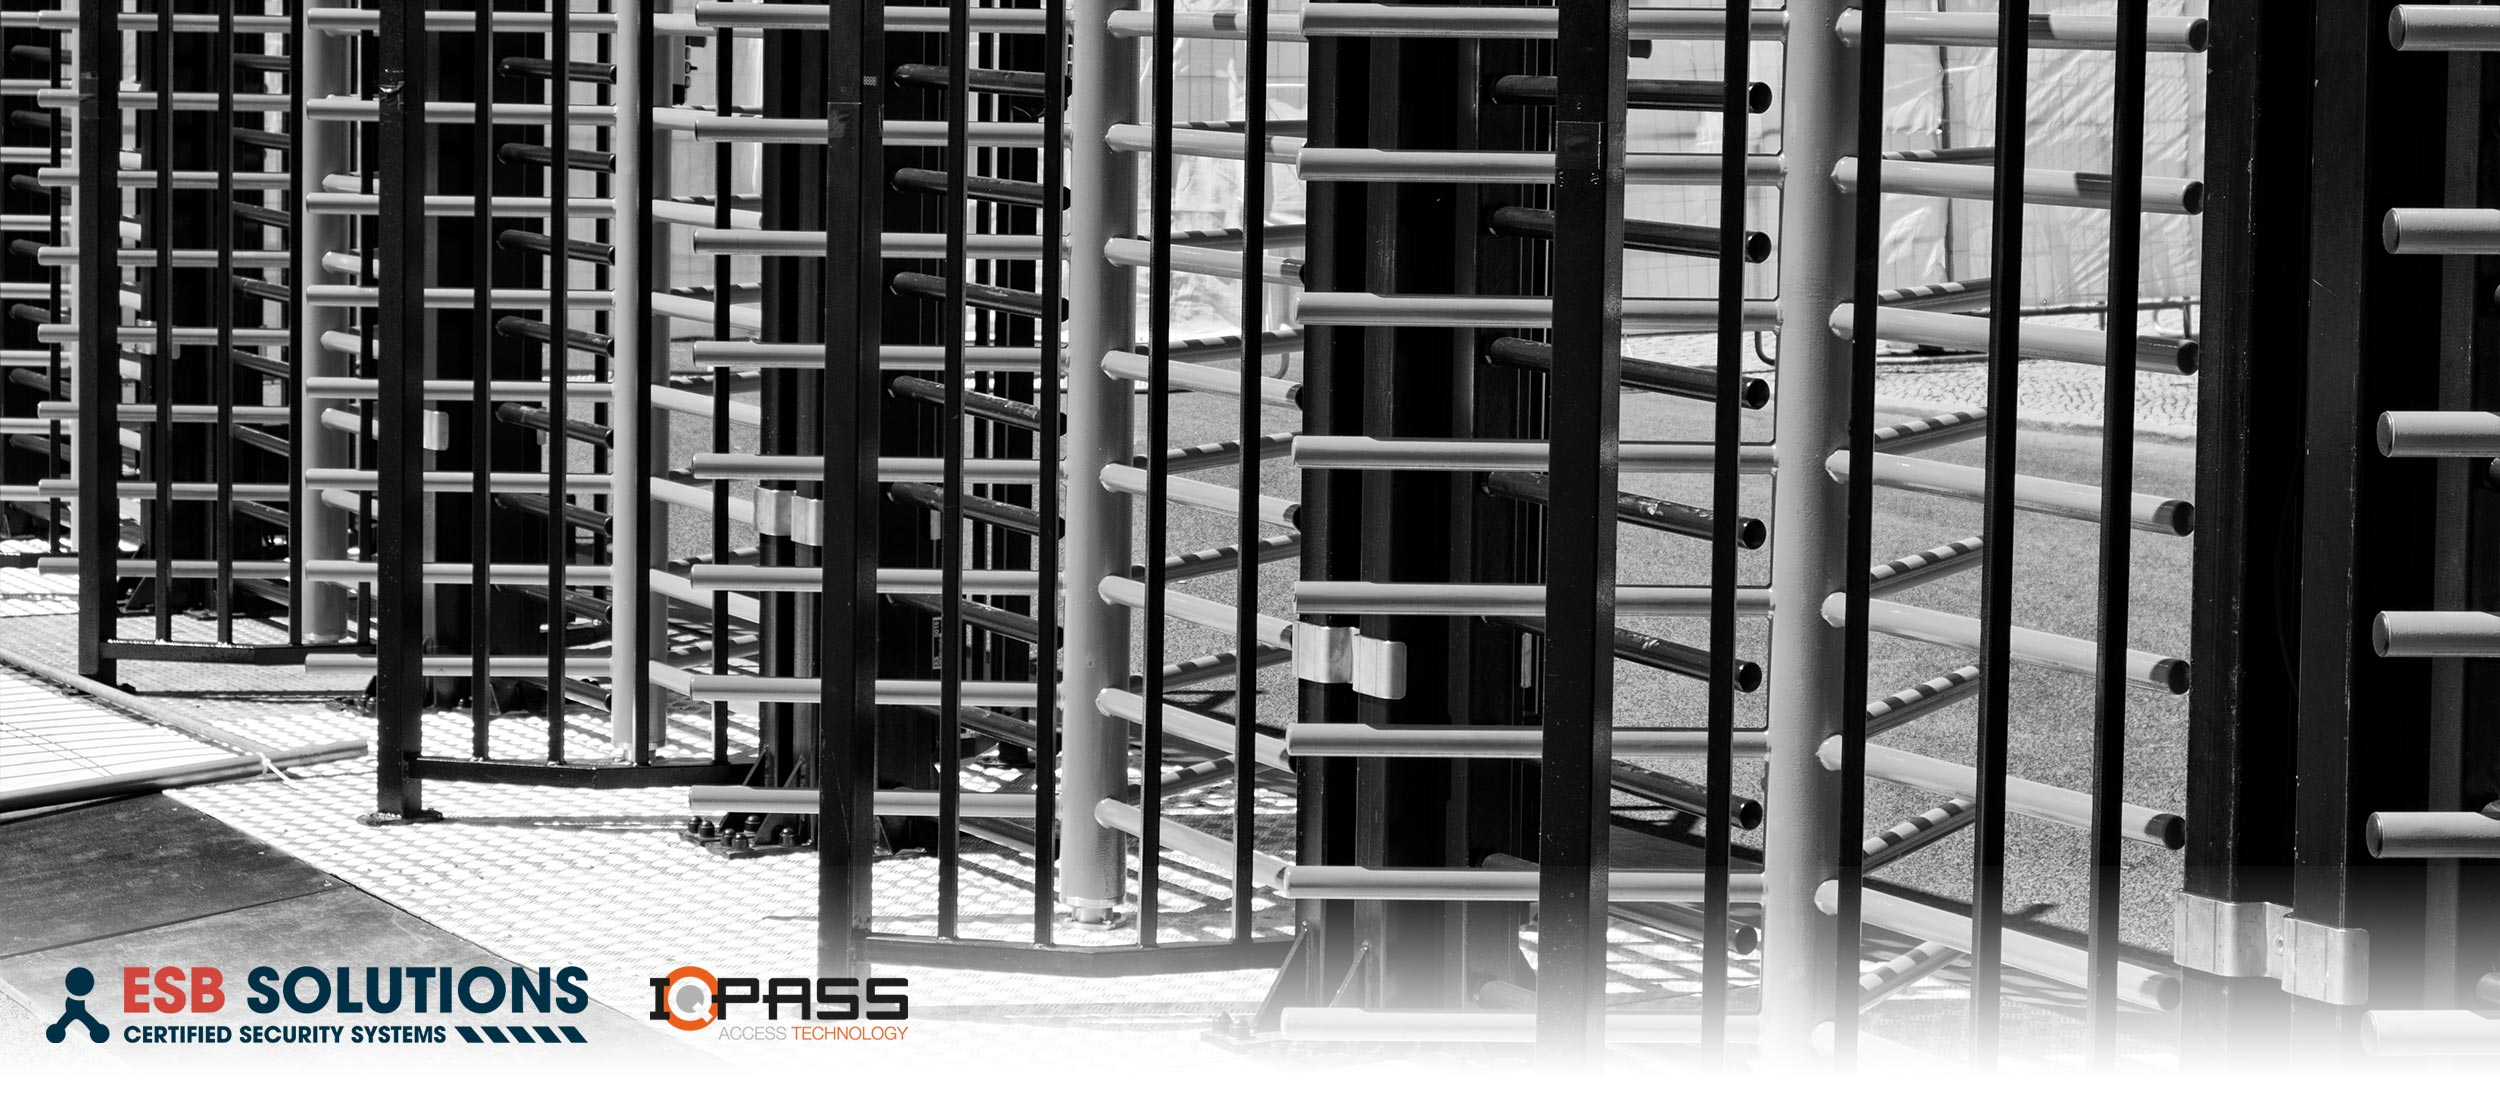 Zutrittskontrollanlage Baustelle ESB Solutions IQ-Pass